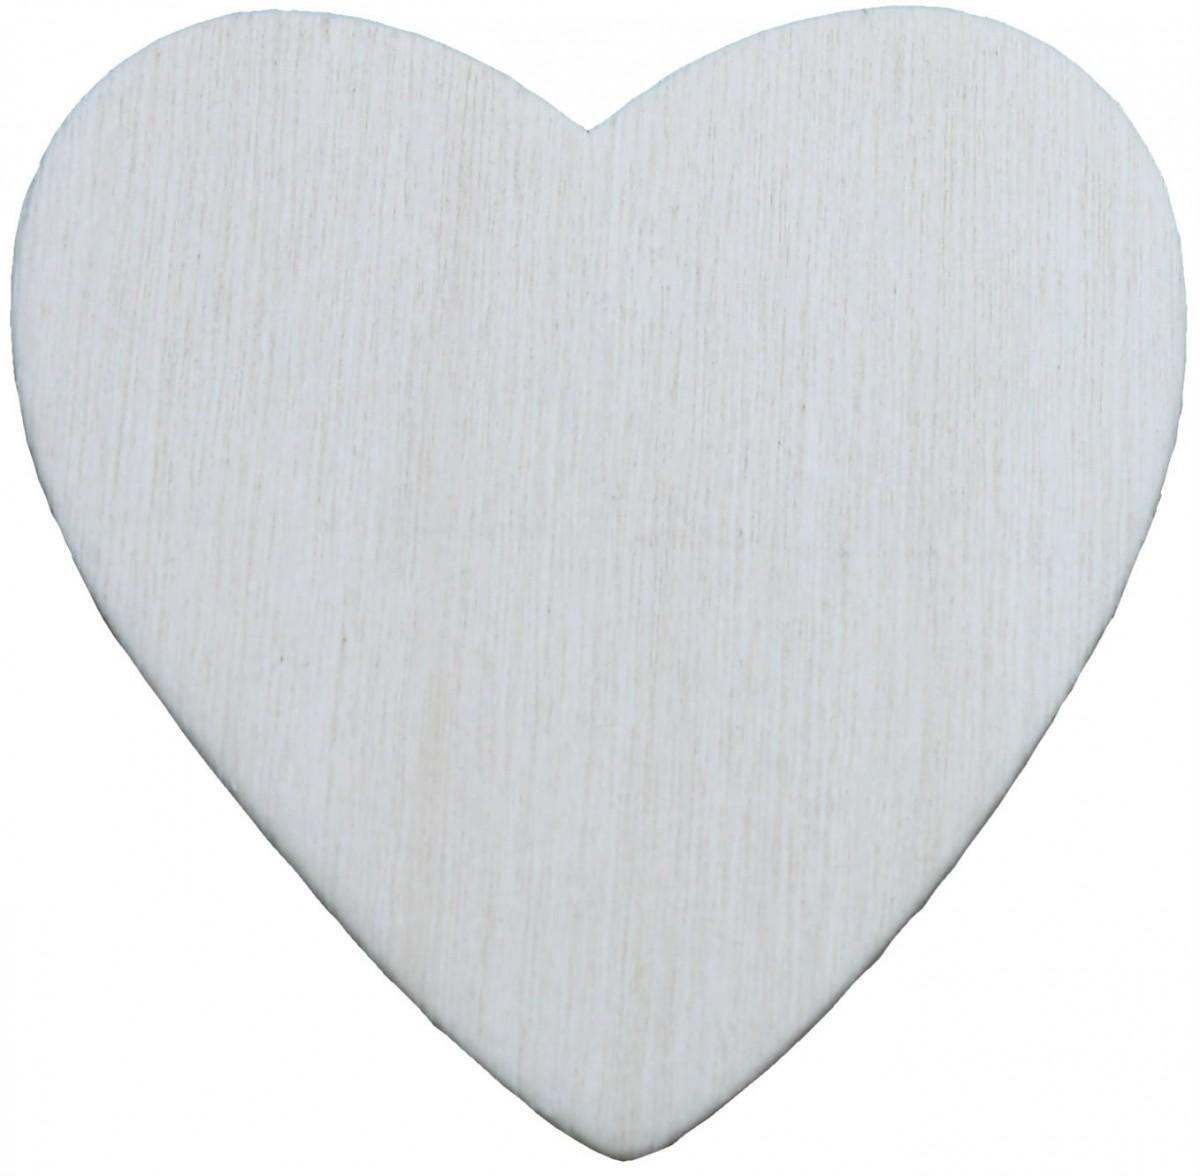 Holzherzen natur 30 Stück 4,2cm - zum Basteln, Bemalen, Streu-Deko, Tischdeko